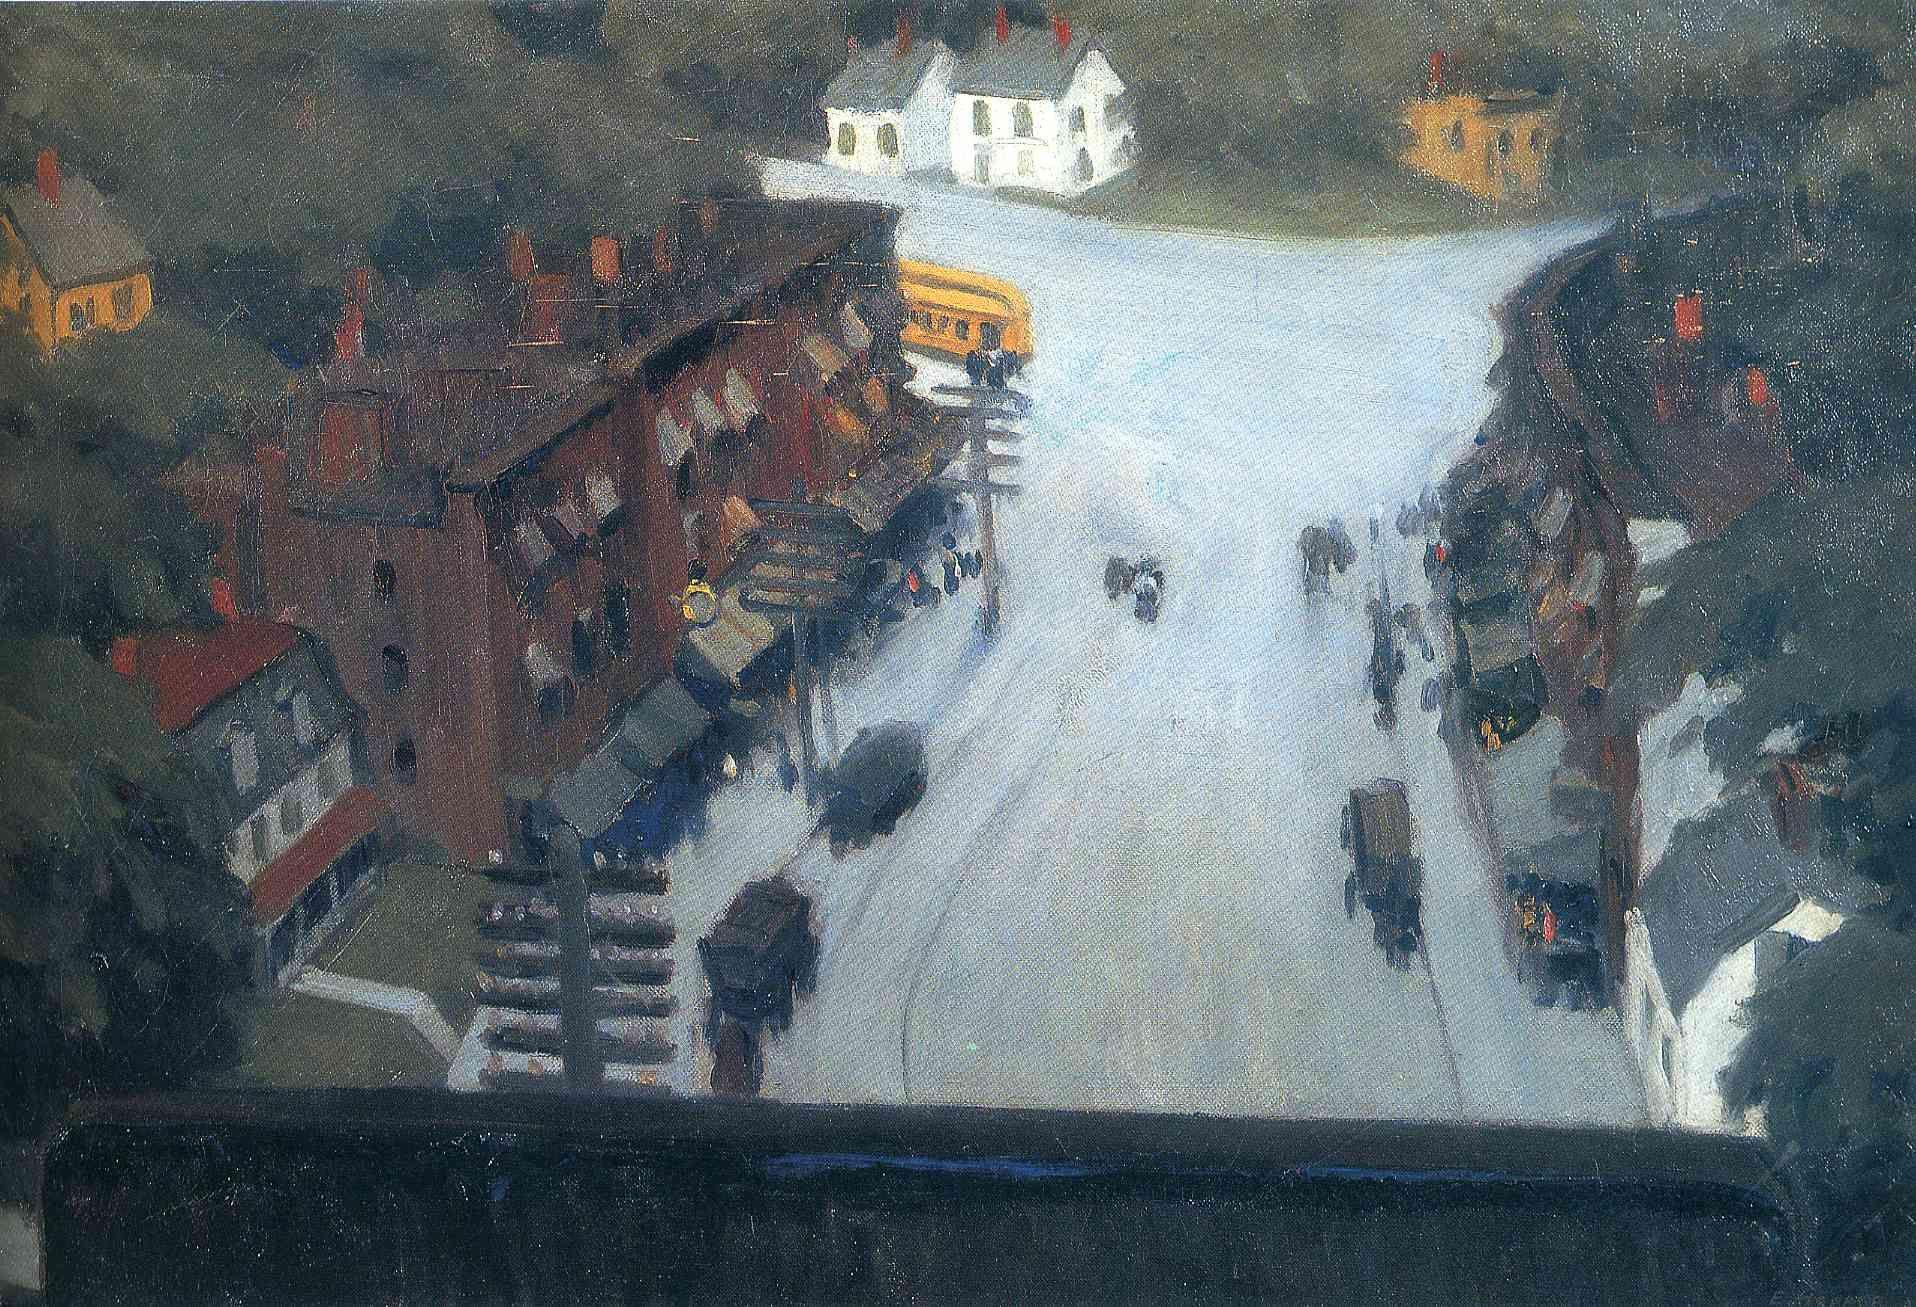 American Landscape: 1920 by Edward Hopper -etching ...  |1950s American Realism Art Landscapes